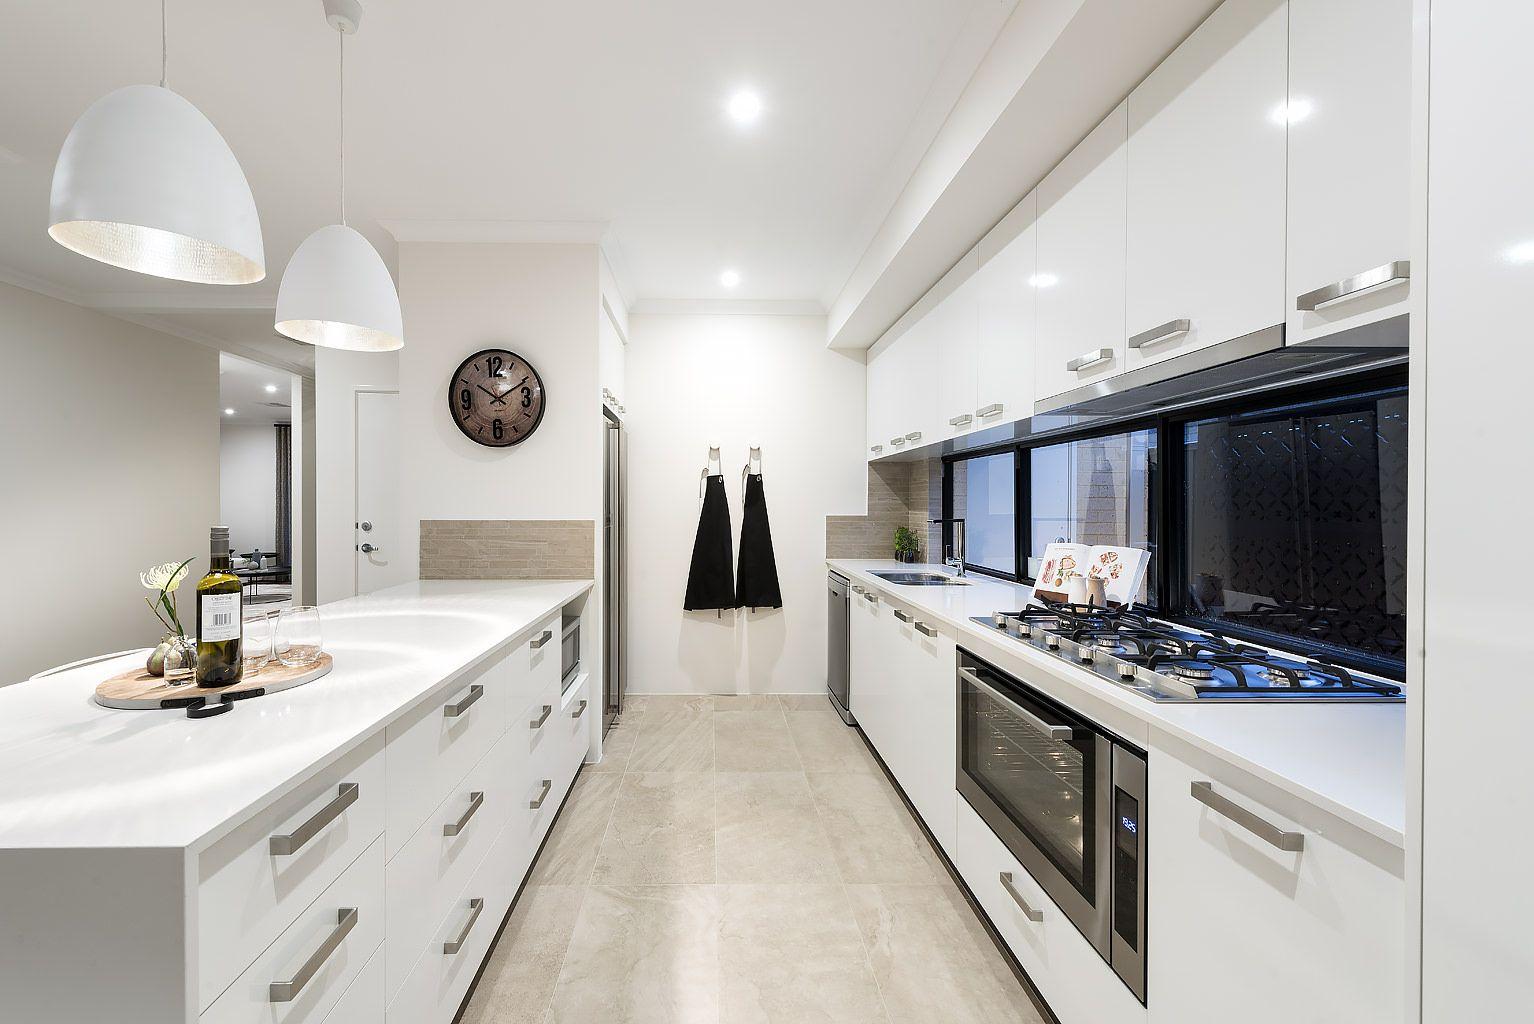 Lot 28 Star Street, Treendale, Australind WA 6233, Image 0